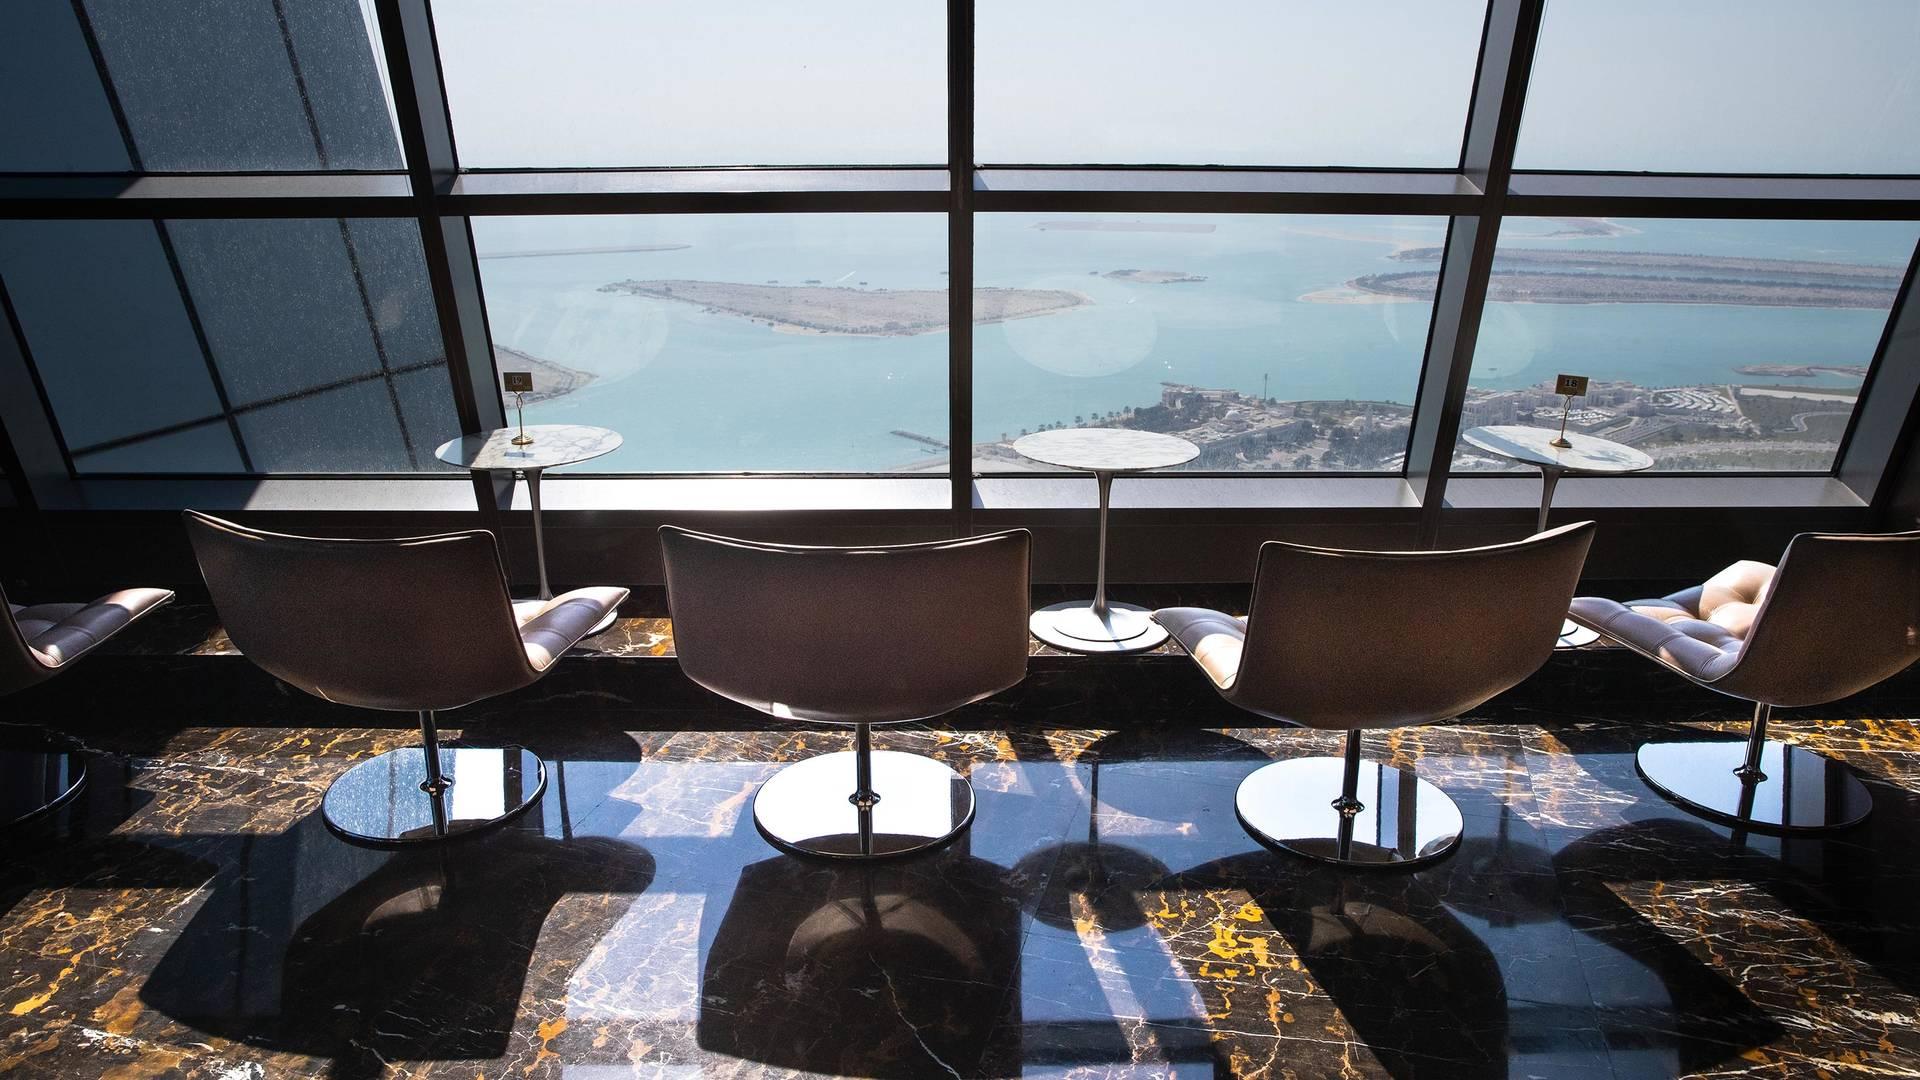 Observation deck at Jumeirah Etihad Towers